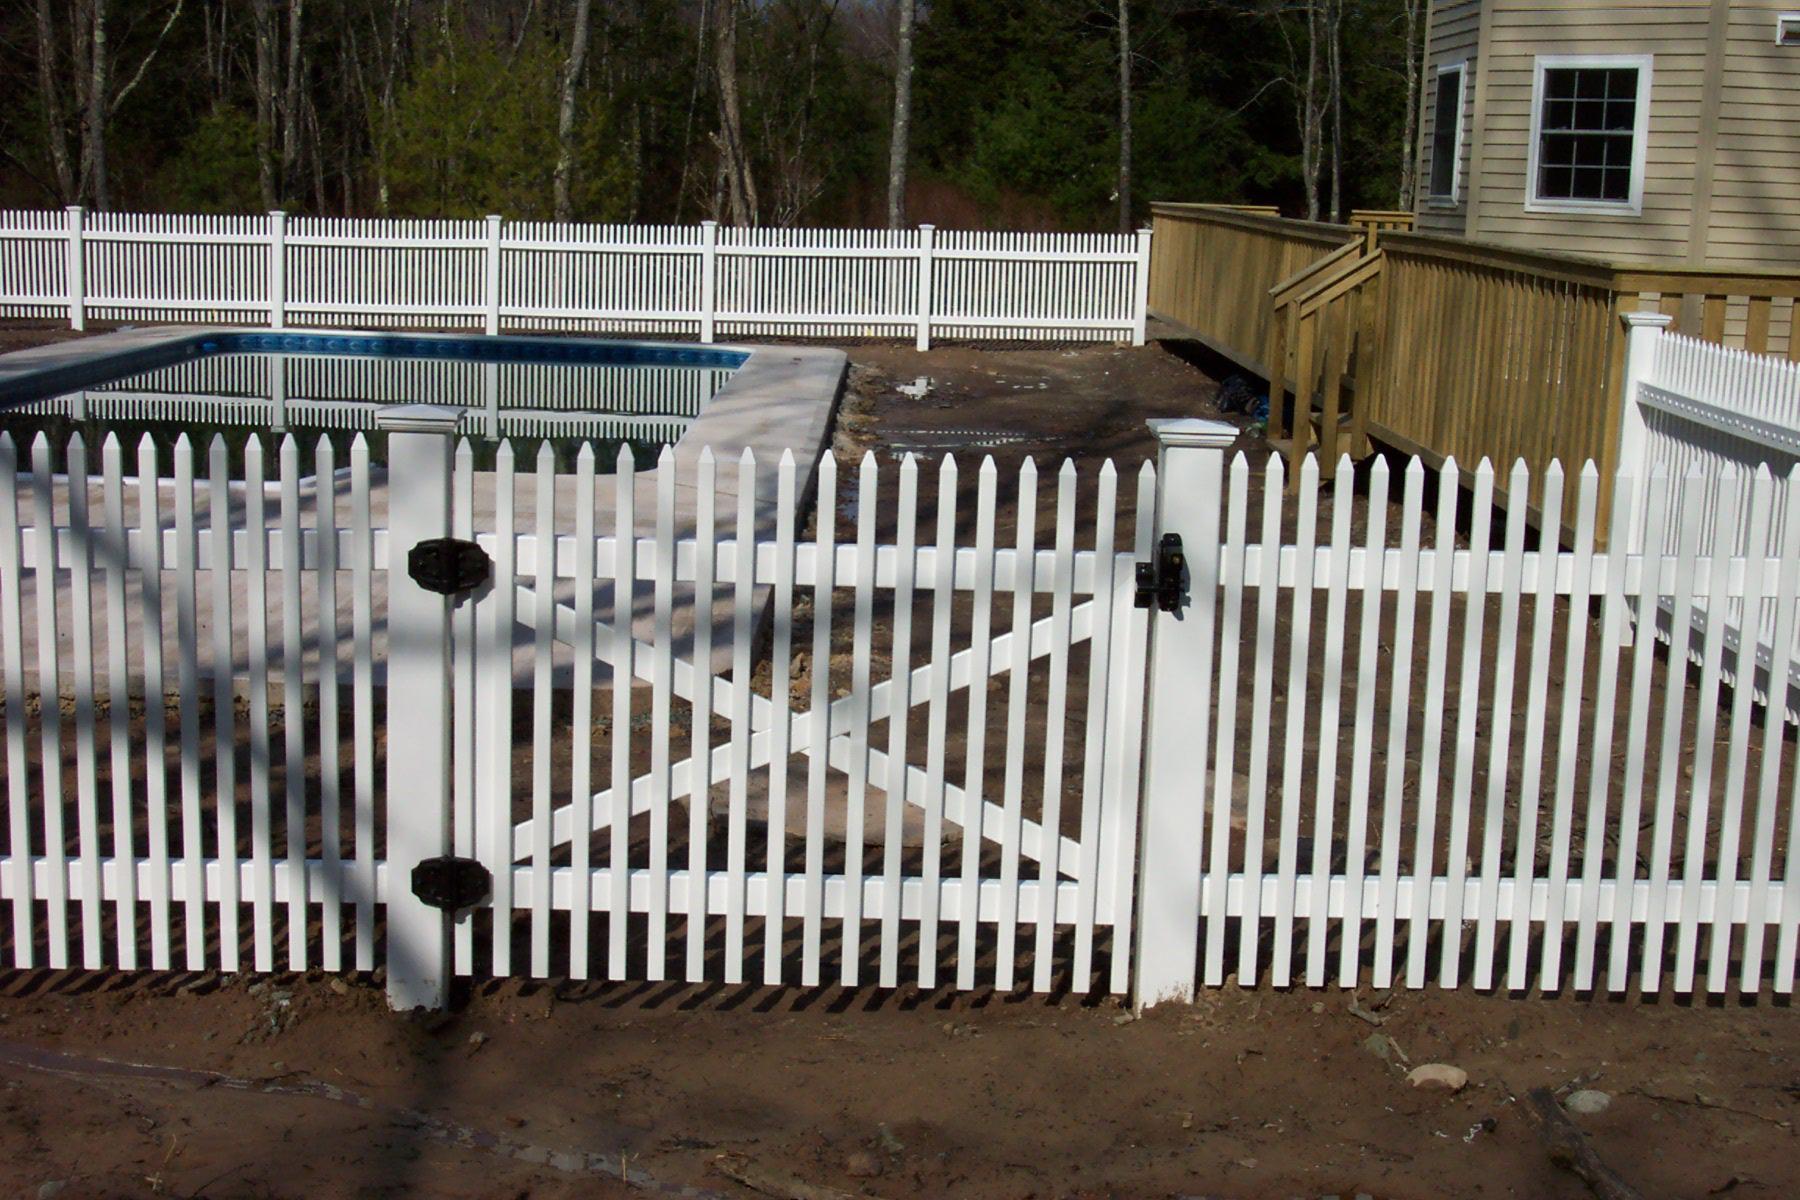 Vinyl Fence Ketcham Fenceketcham Fence